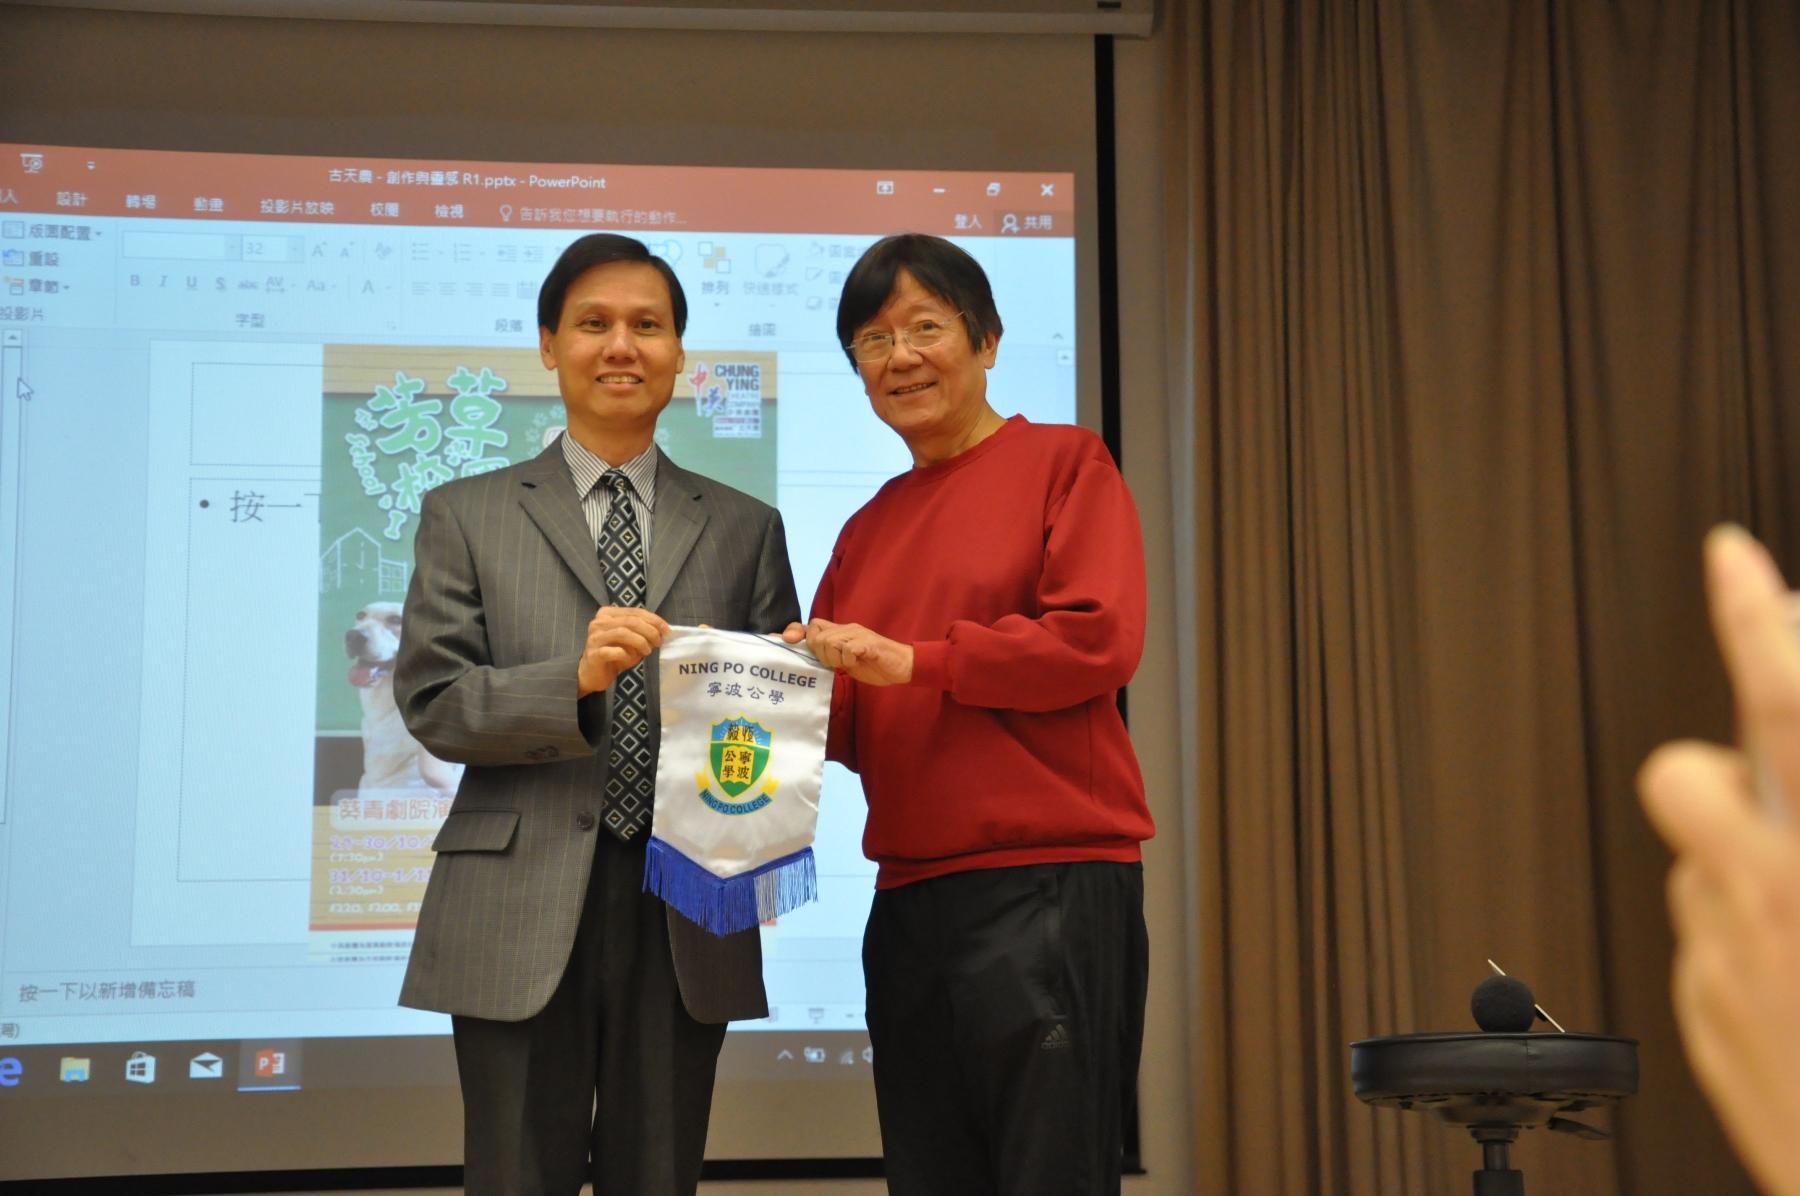 http://www.npc.edu.hk/sites/default/files/dsc_0051.jpg